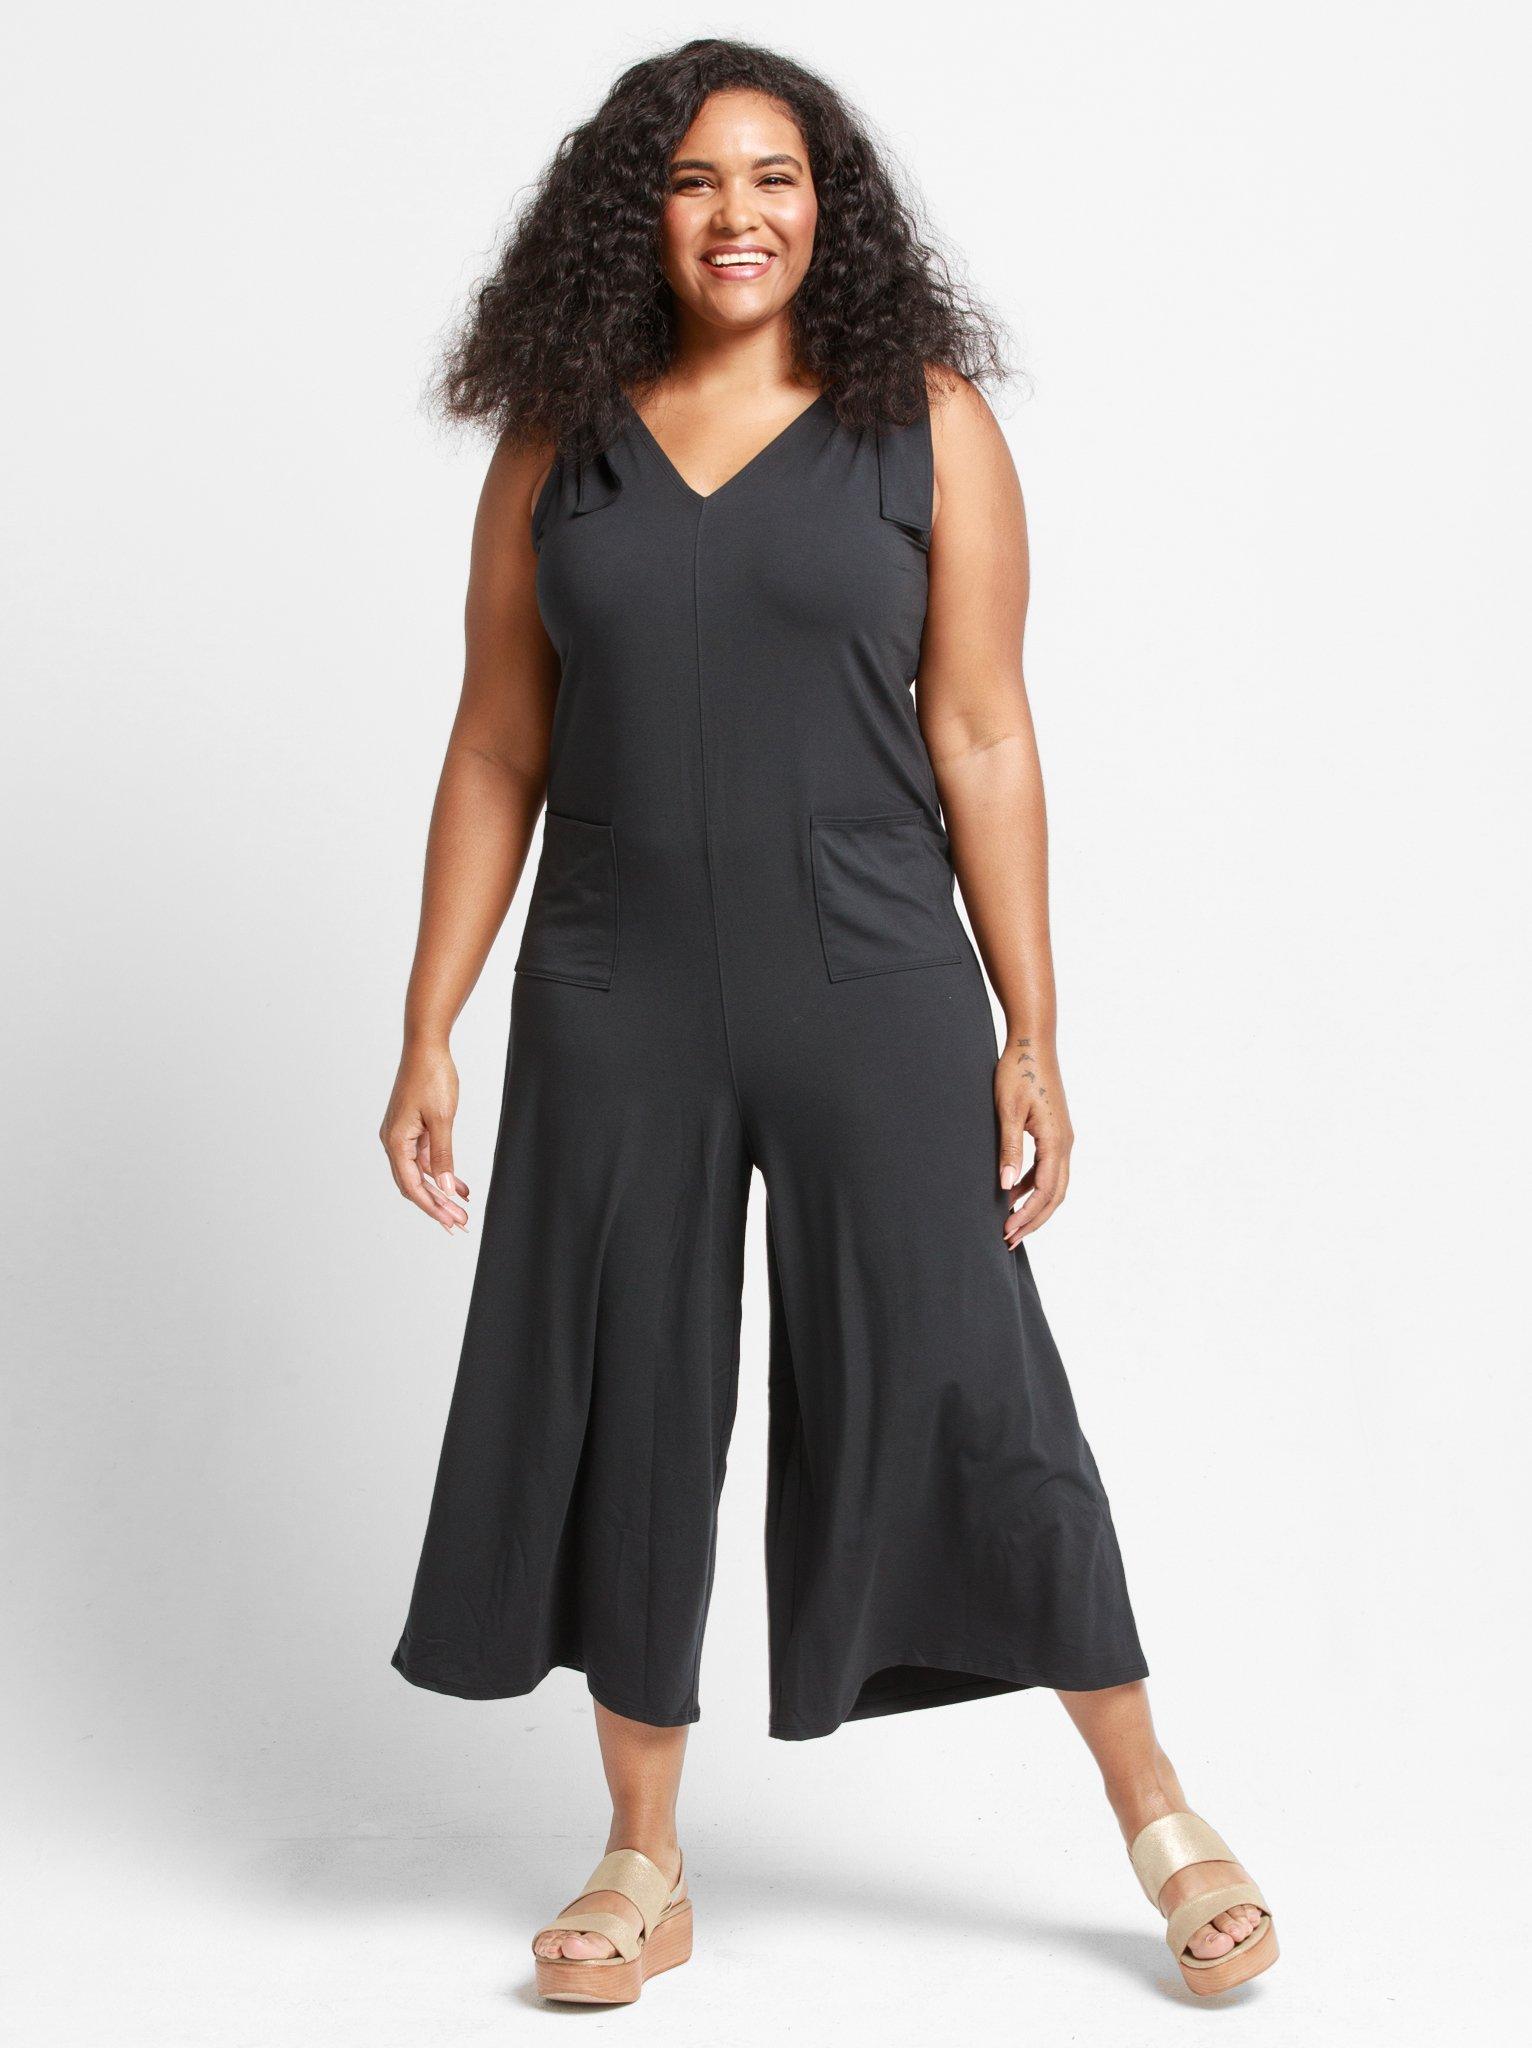 Able's Ashleigh utility jumpsuit